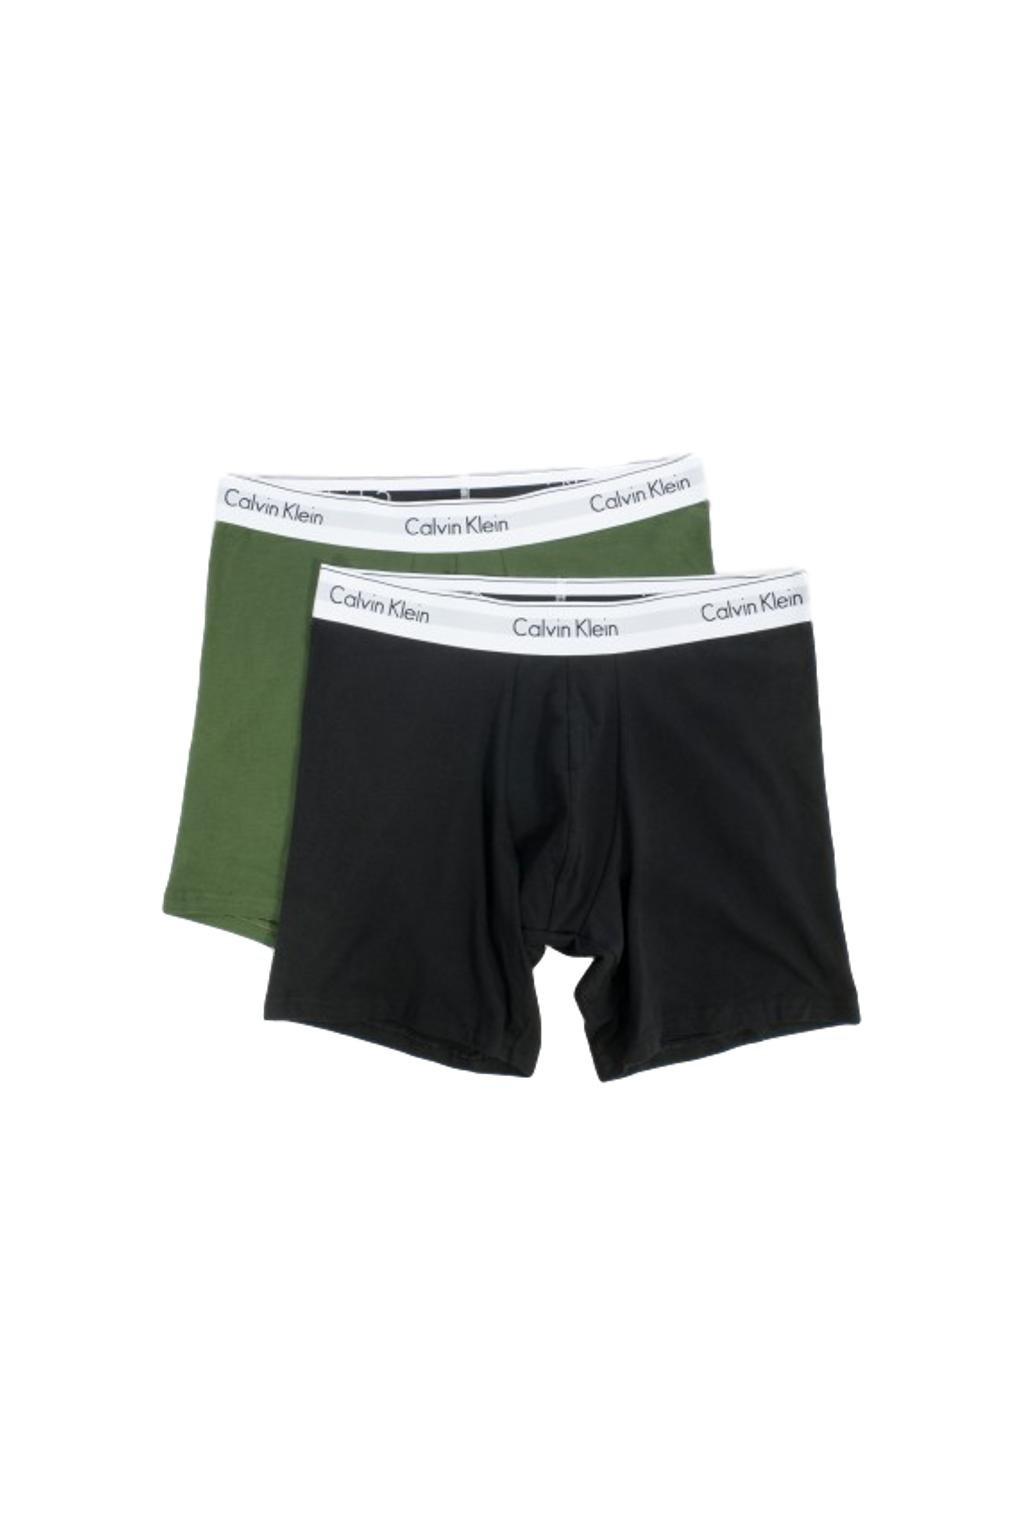 Calvin Klein Modern Cotton boxerky 2- balení - černá/khaki